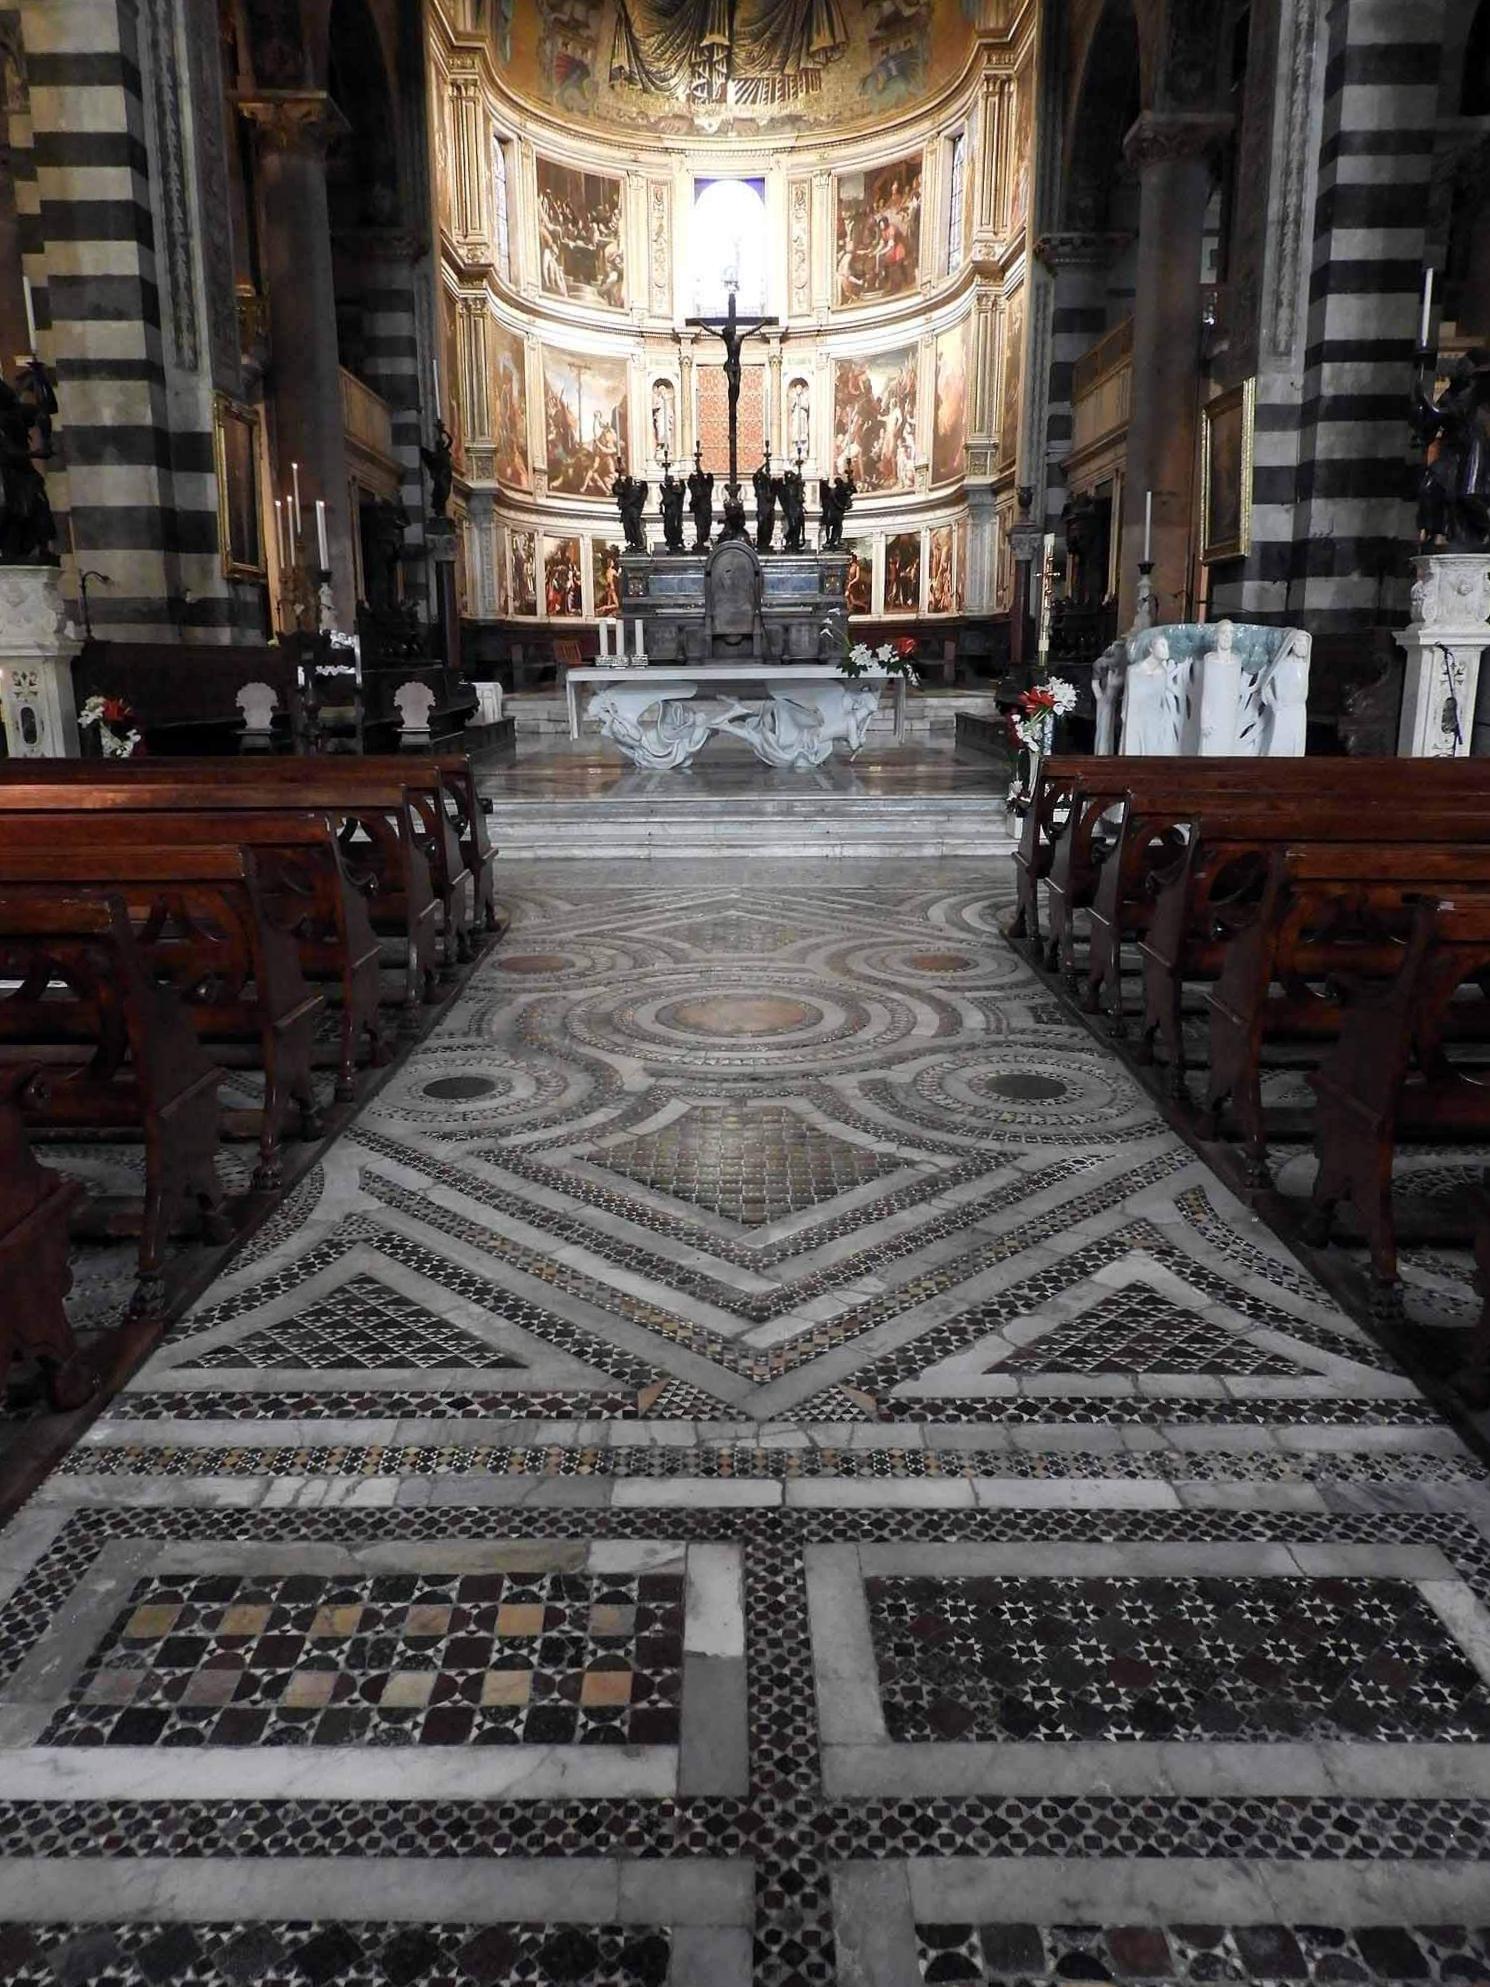 italy-italia-pisa-batptistry-mosaic-floor.JPG